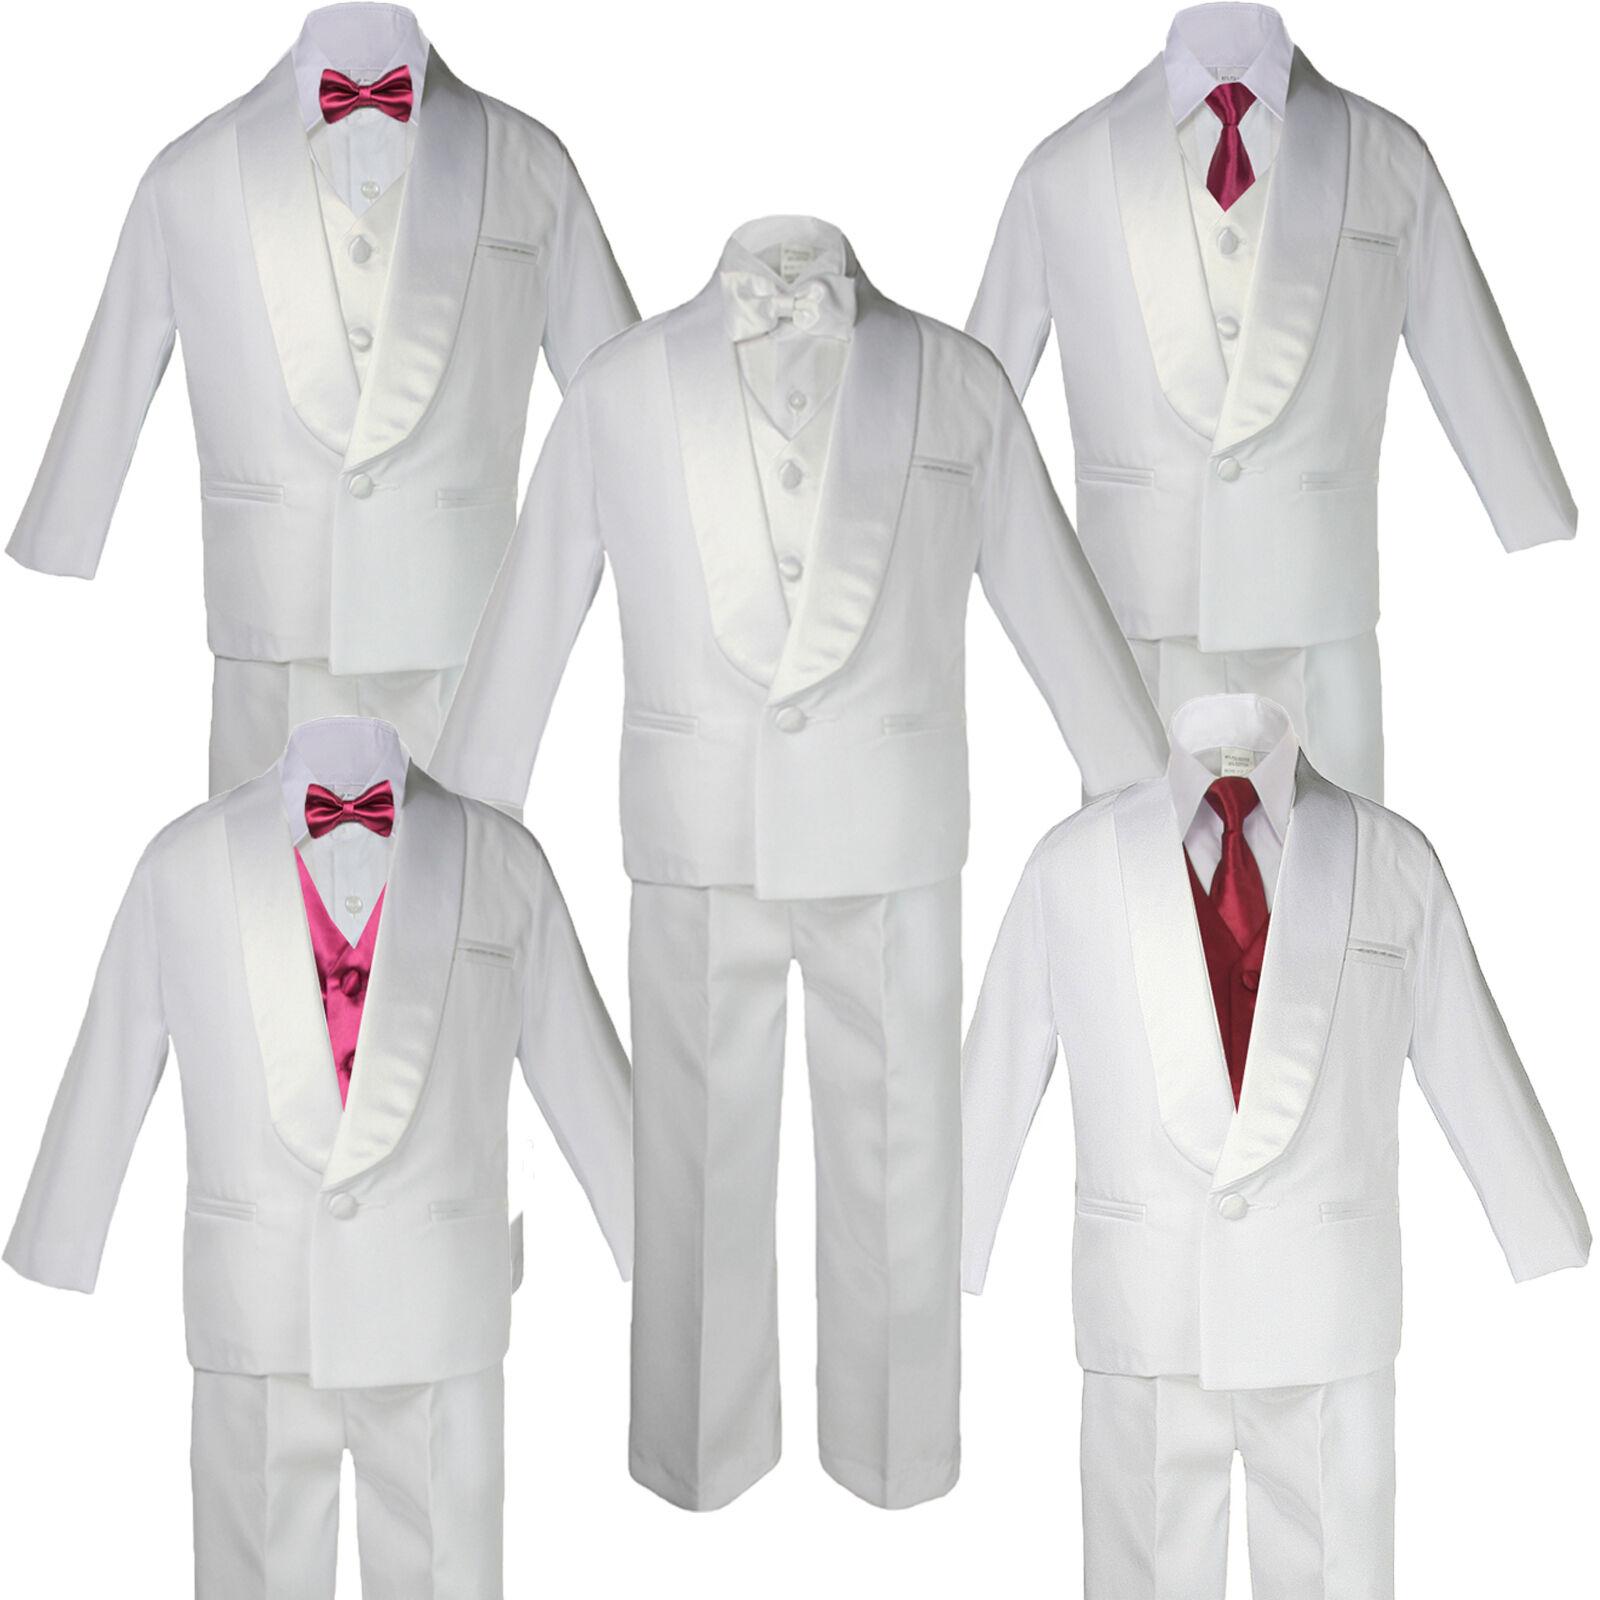 5-7pc Boys White Satin Shawl Lapel Suits Tuxedo Burgundy ...